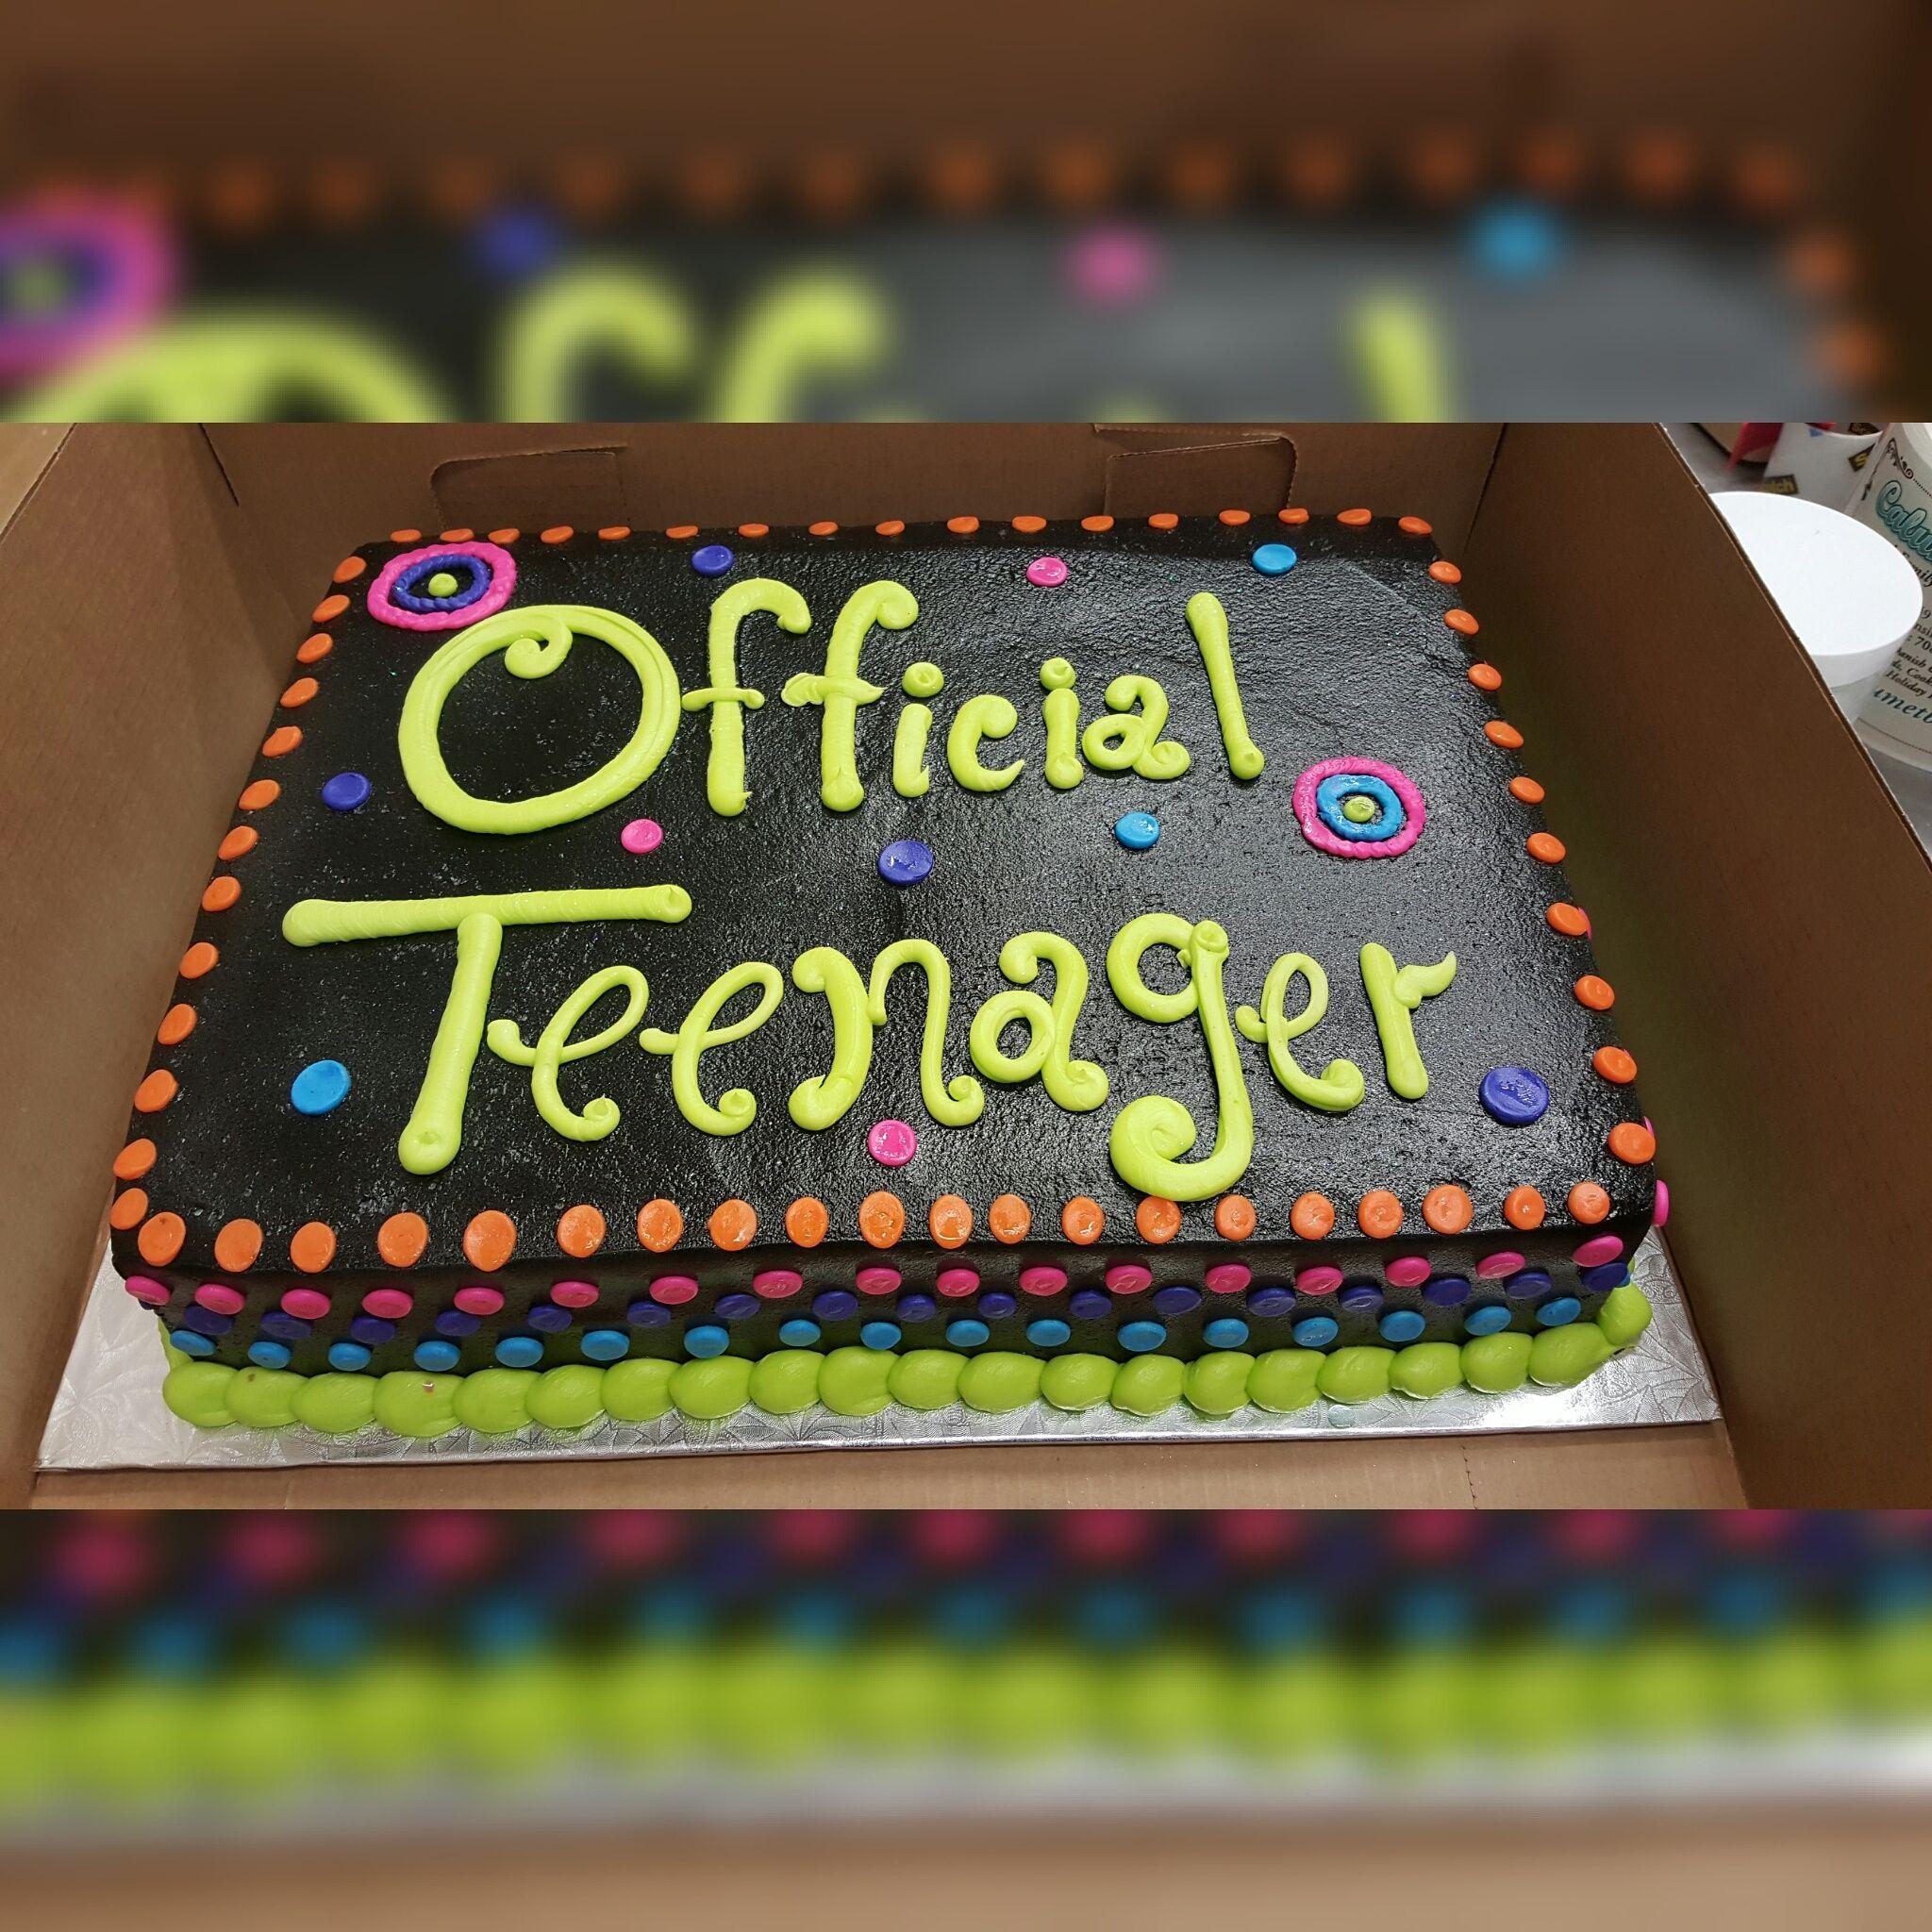 Calumet Bakery Official Teenager Cake